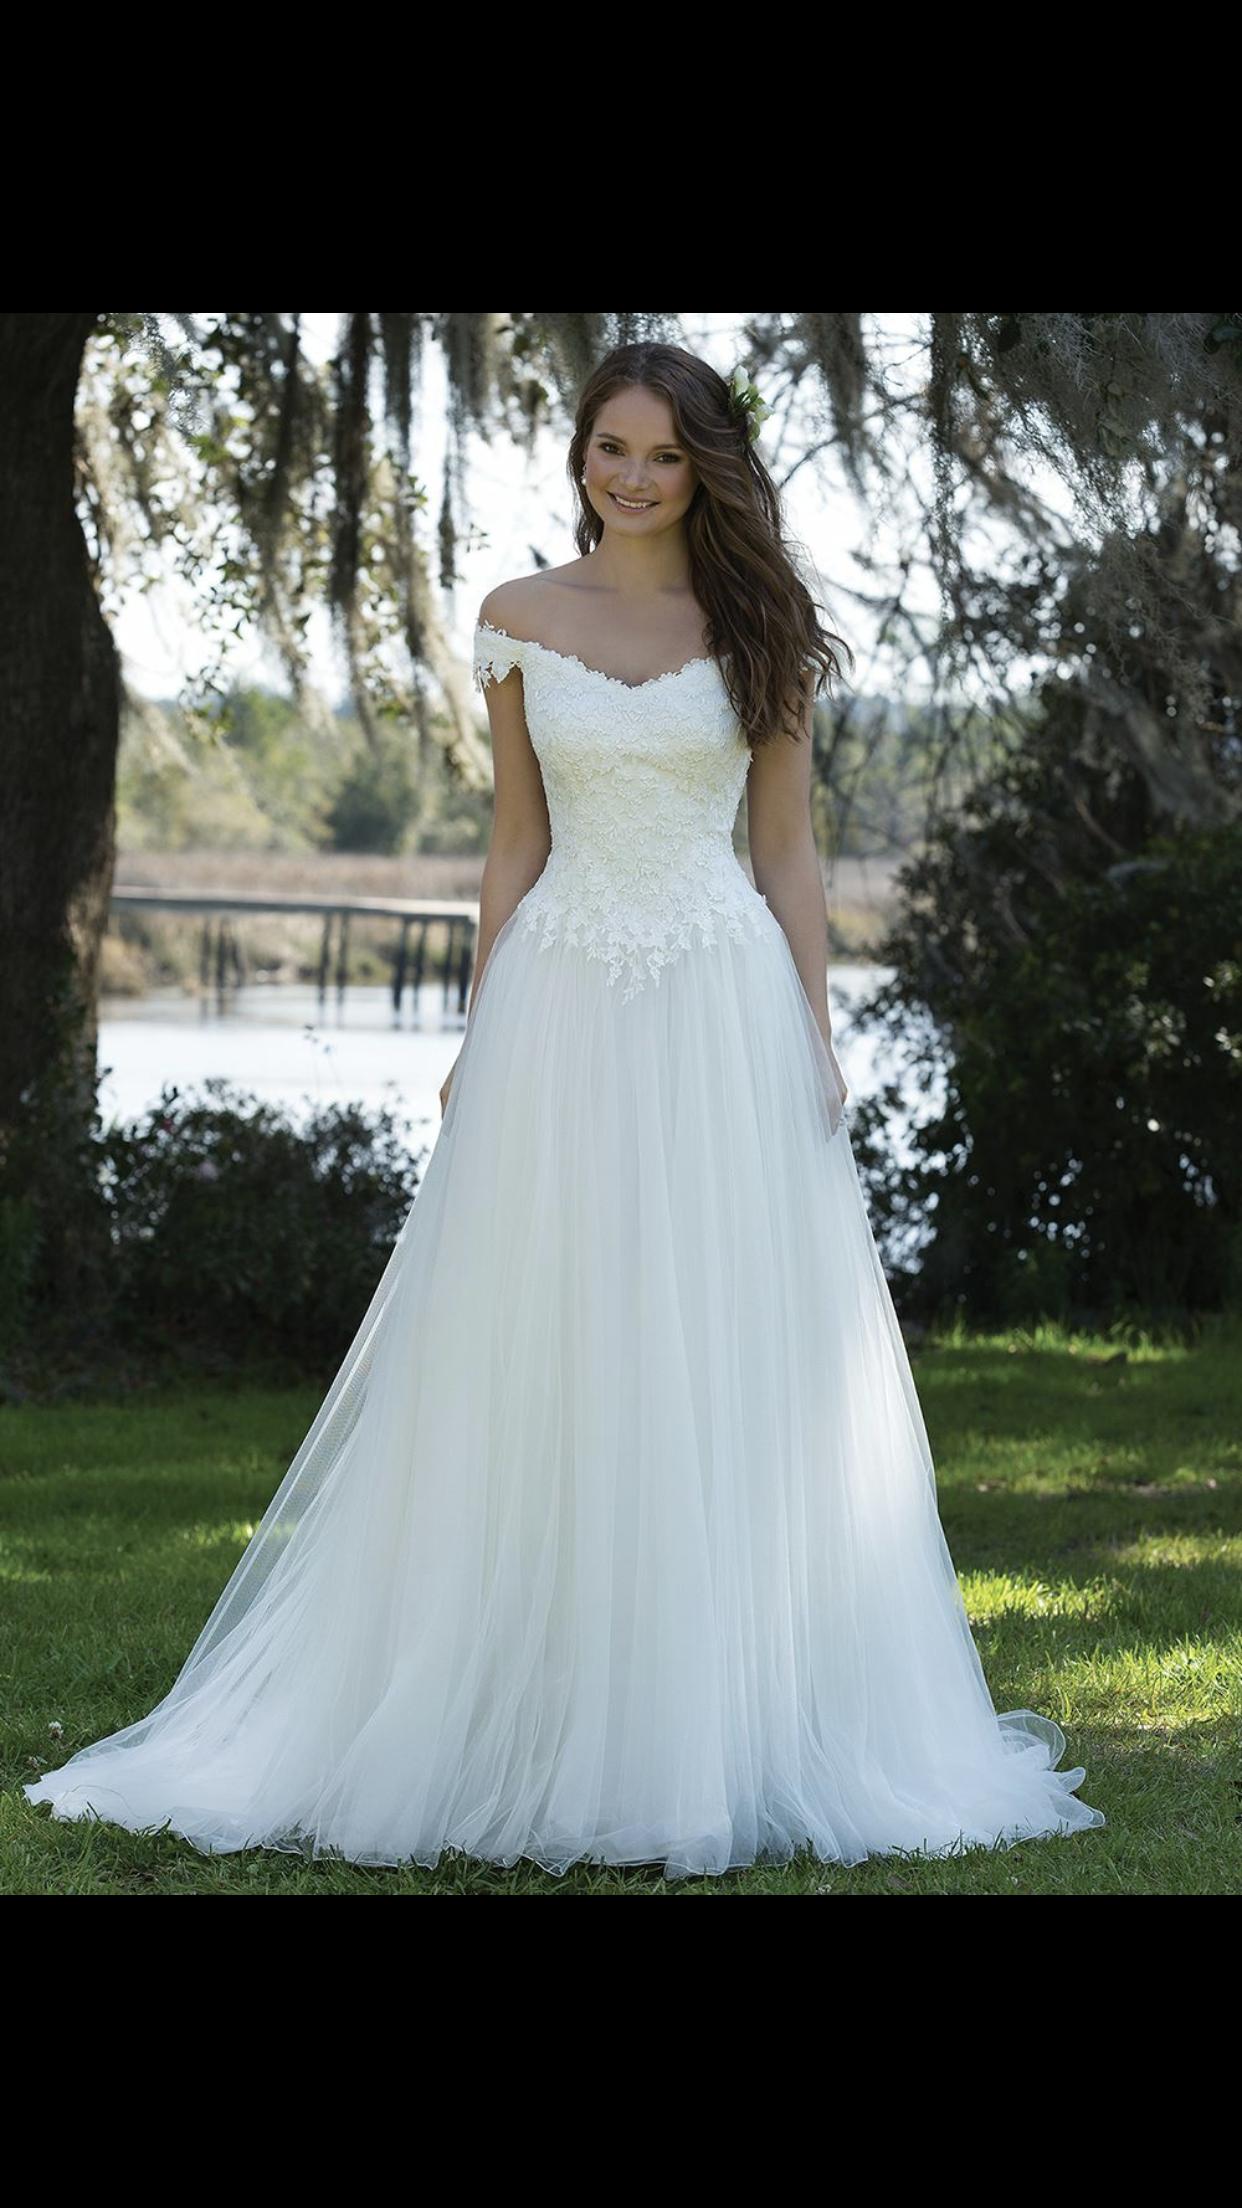 Wedding dresses cheap plus size  Pin by PAULINA DURAN on vestidos de novia  Pinterest  Wedding